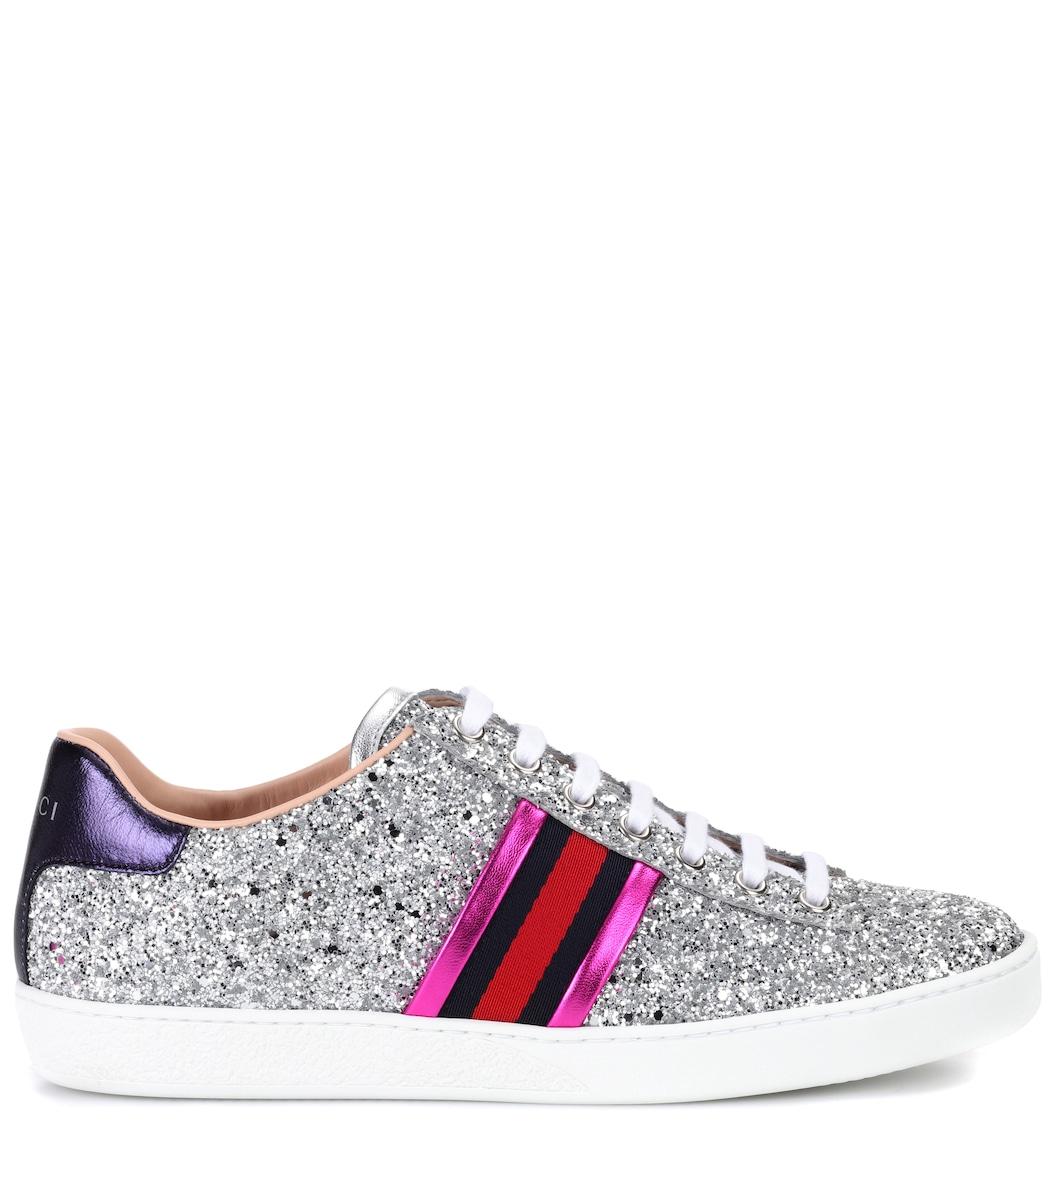 6e6acb5f6776 Gucci - Ace glitter sneakers | Mytheresa